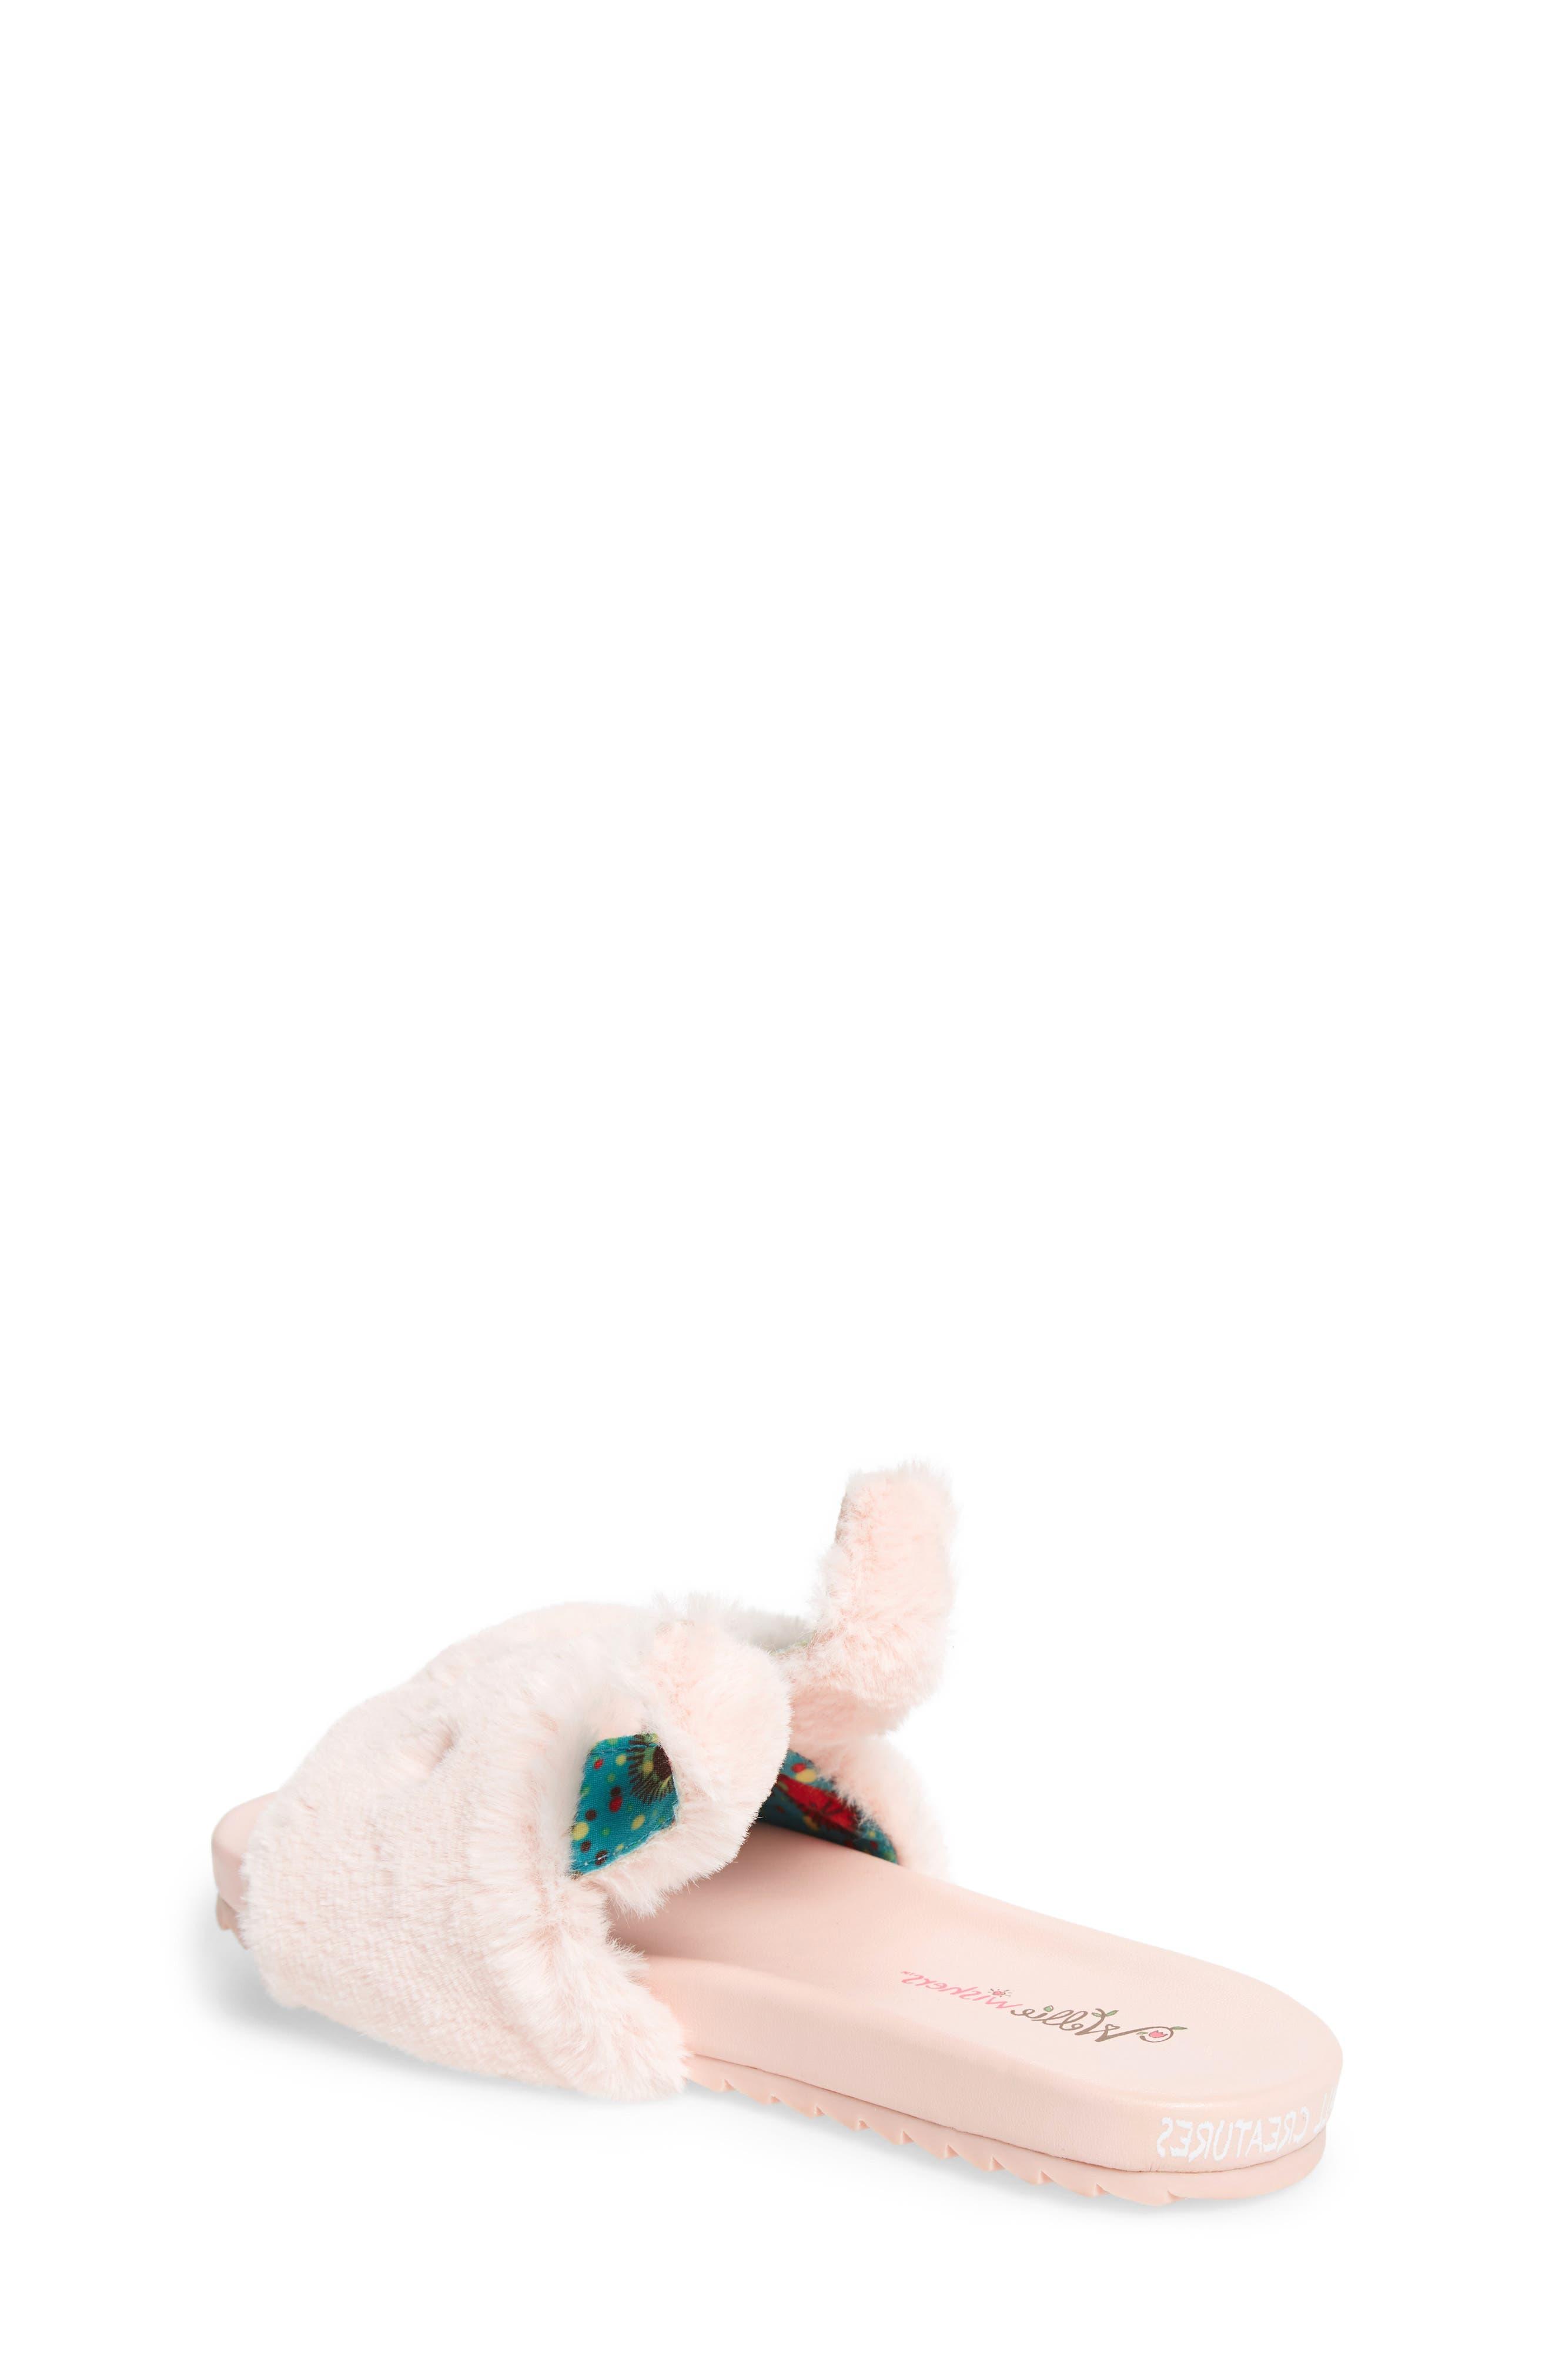 Willa Carrot Faux Fur Slide Sandal,                             Alternate thumbnail 2, color,                             Pink